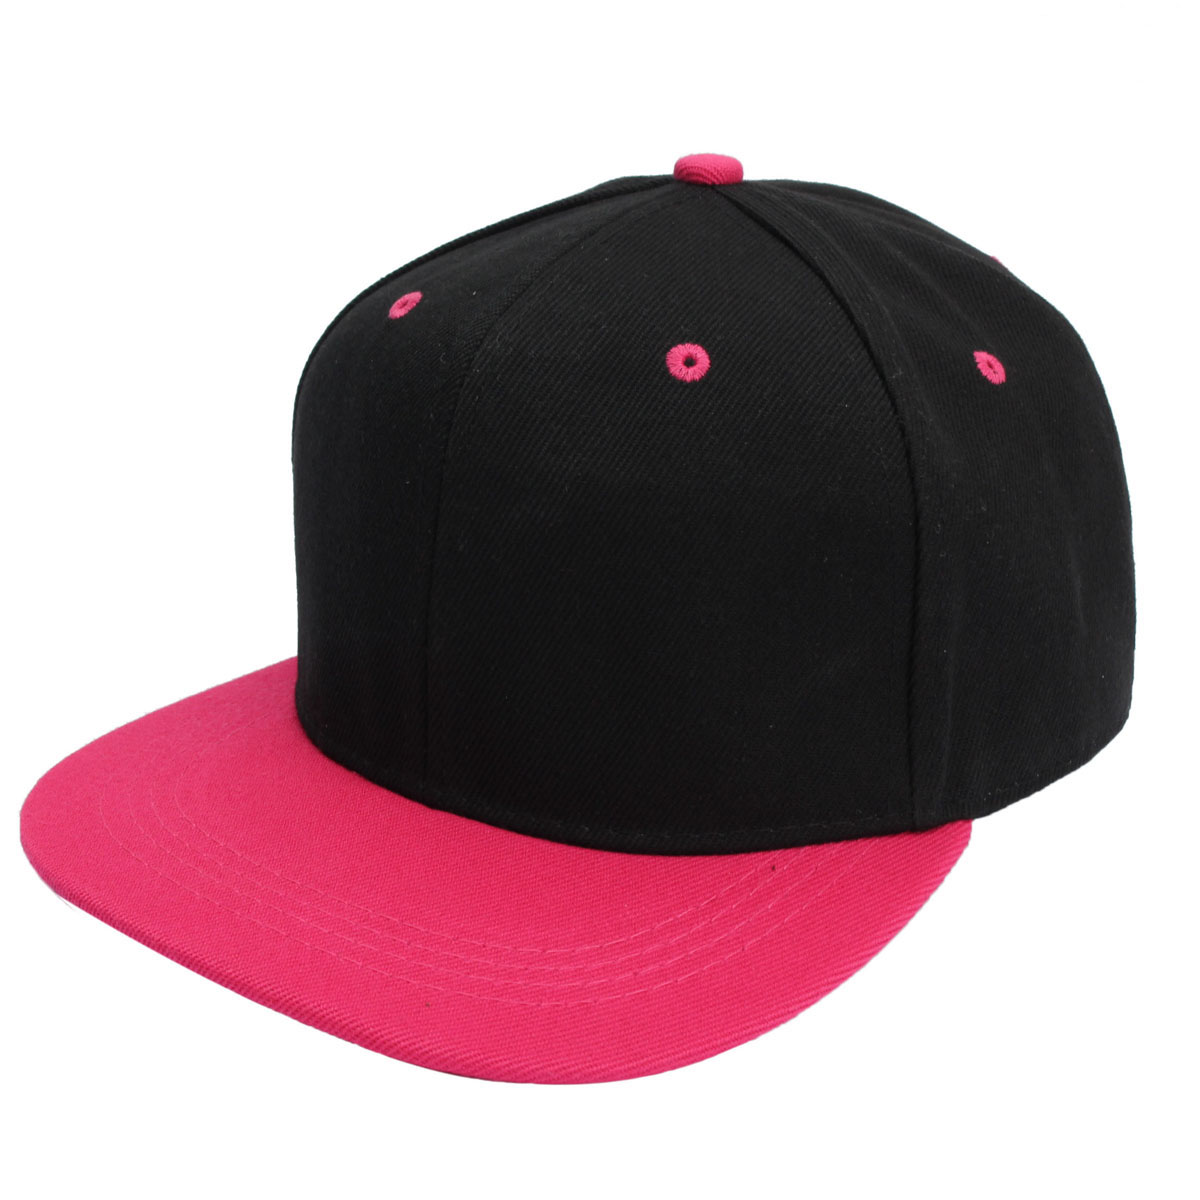 Cool Men's Women Bboy Adjustable Baseball Cap Snapback ...